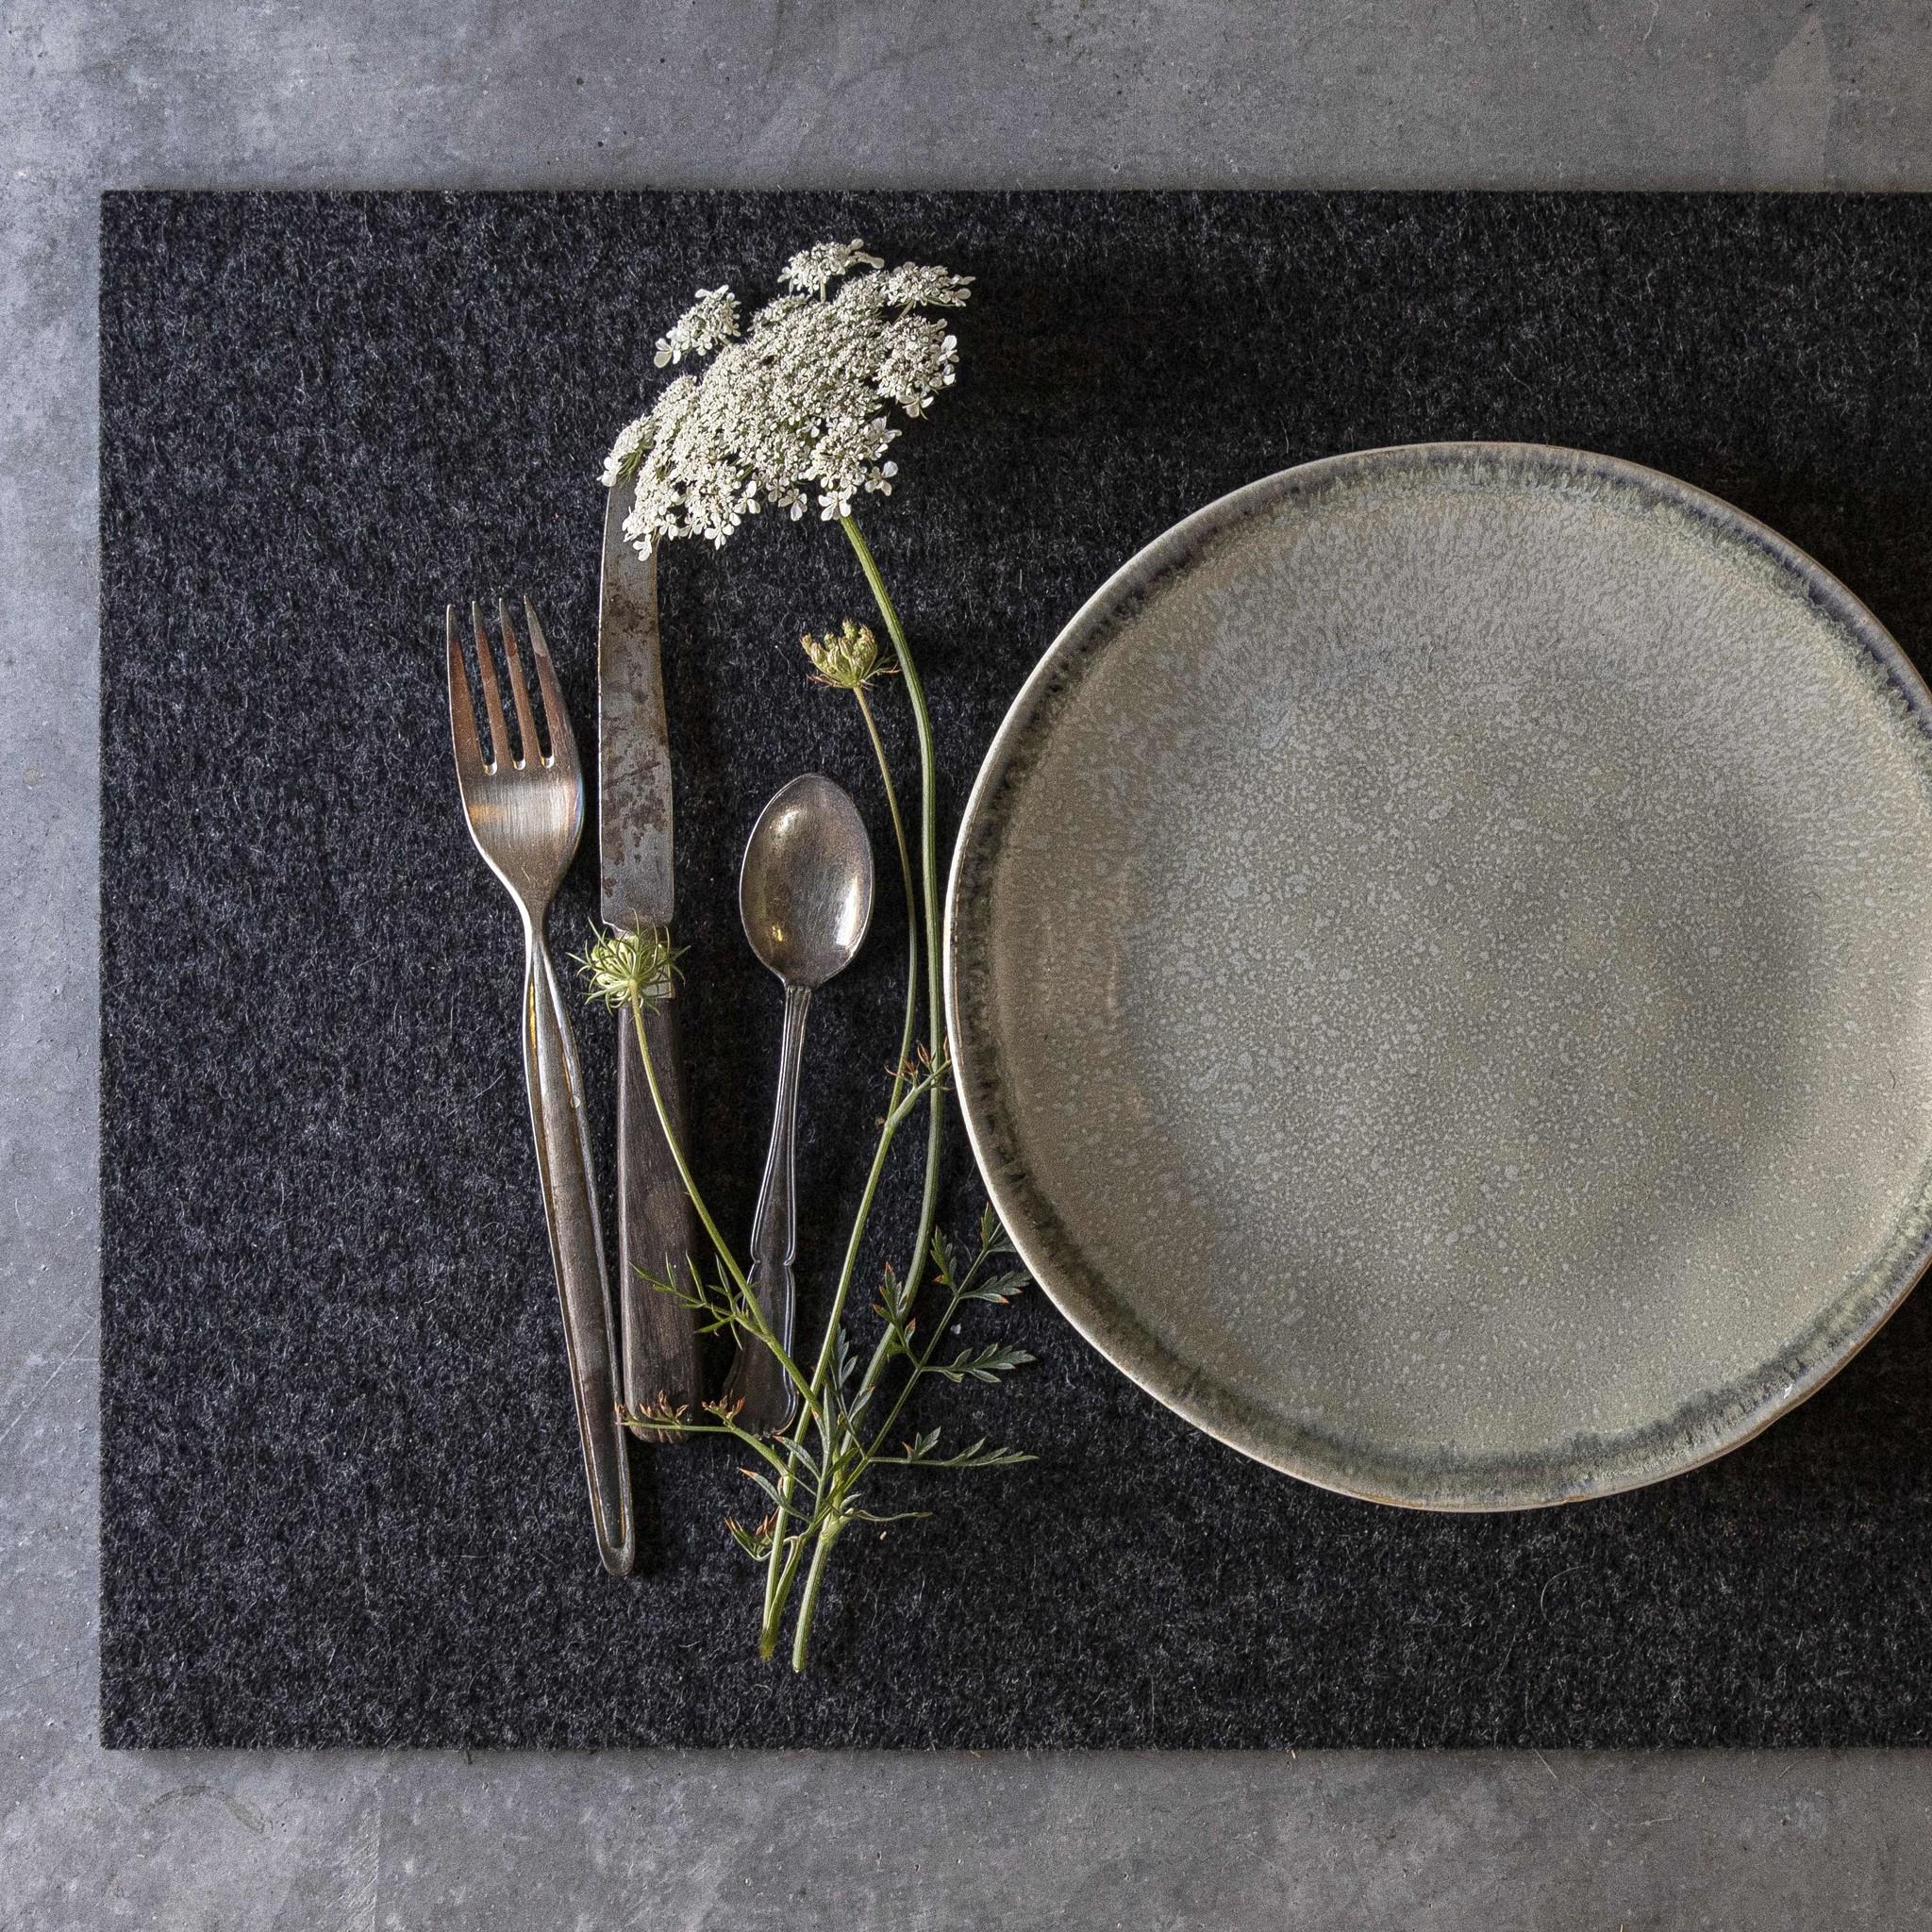 Filz Tischsets rechteckig anthrazit meliert